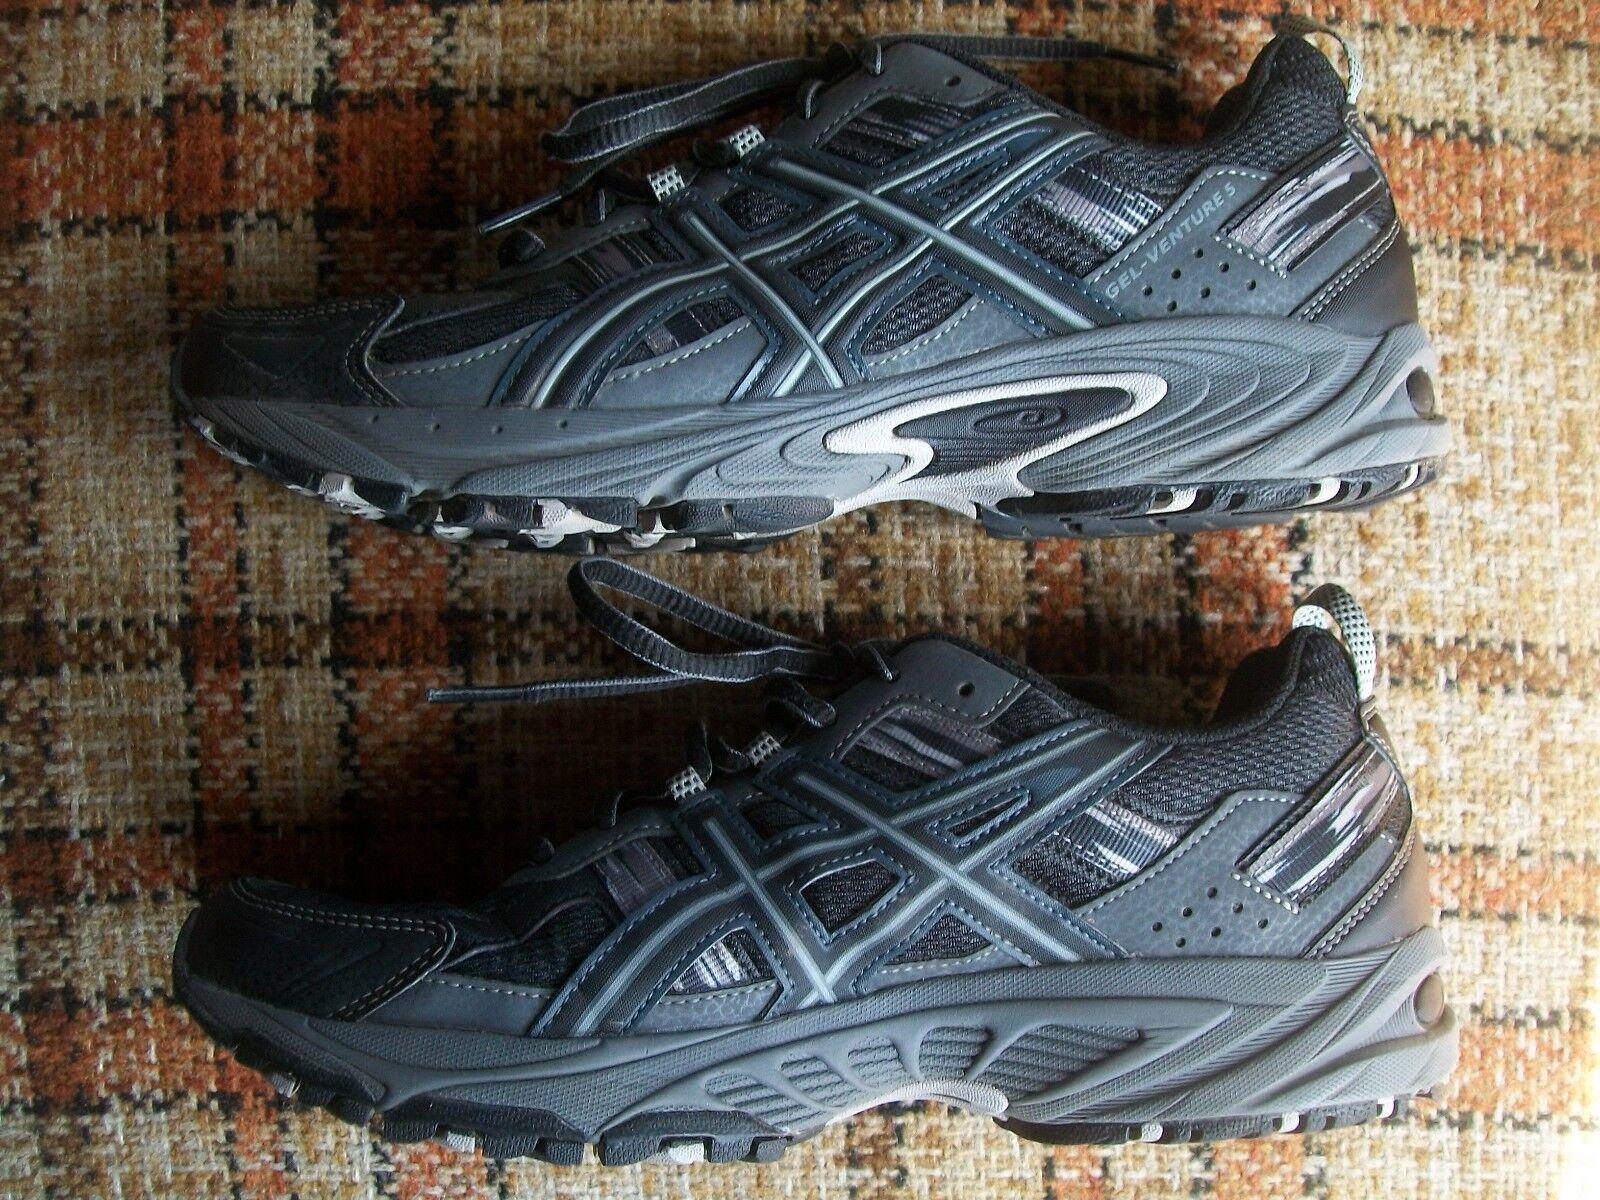 Asics Mens Size 8 Gray (EURO 41.5) Gel-Venture 5 Black Gray 8 T5N3N f0a56e